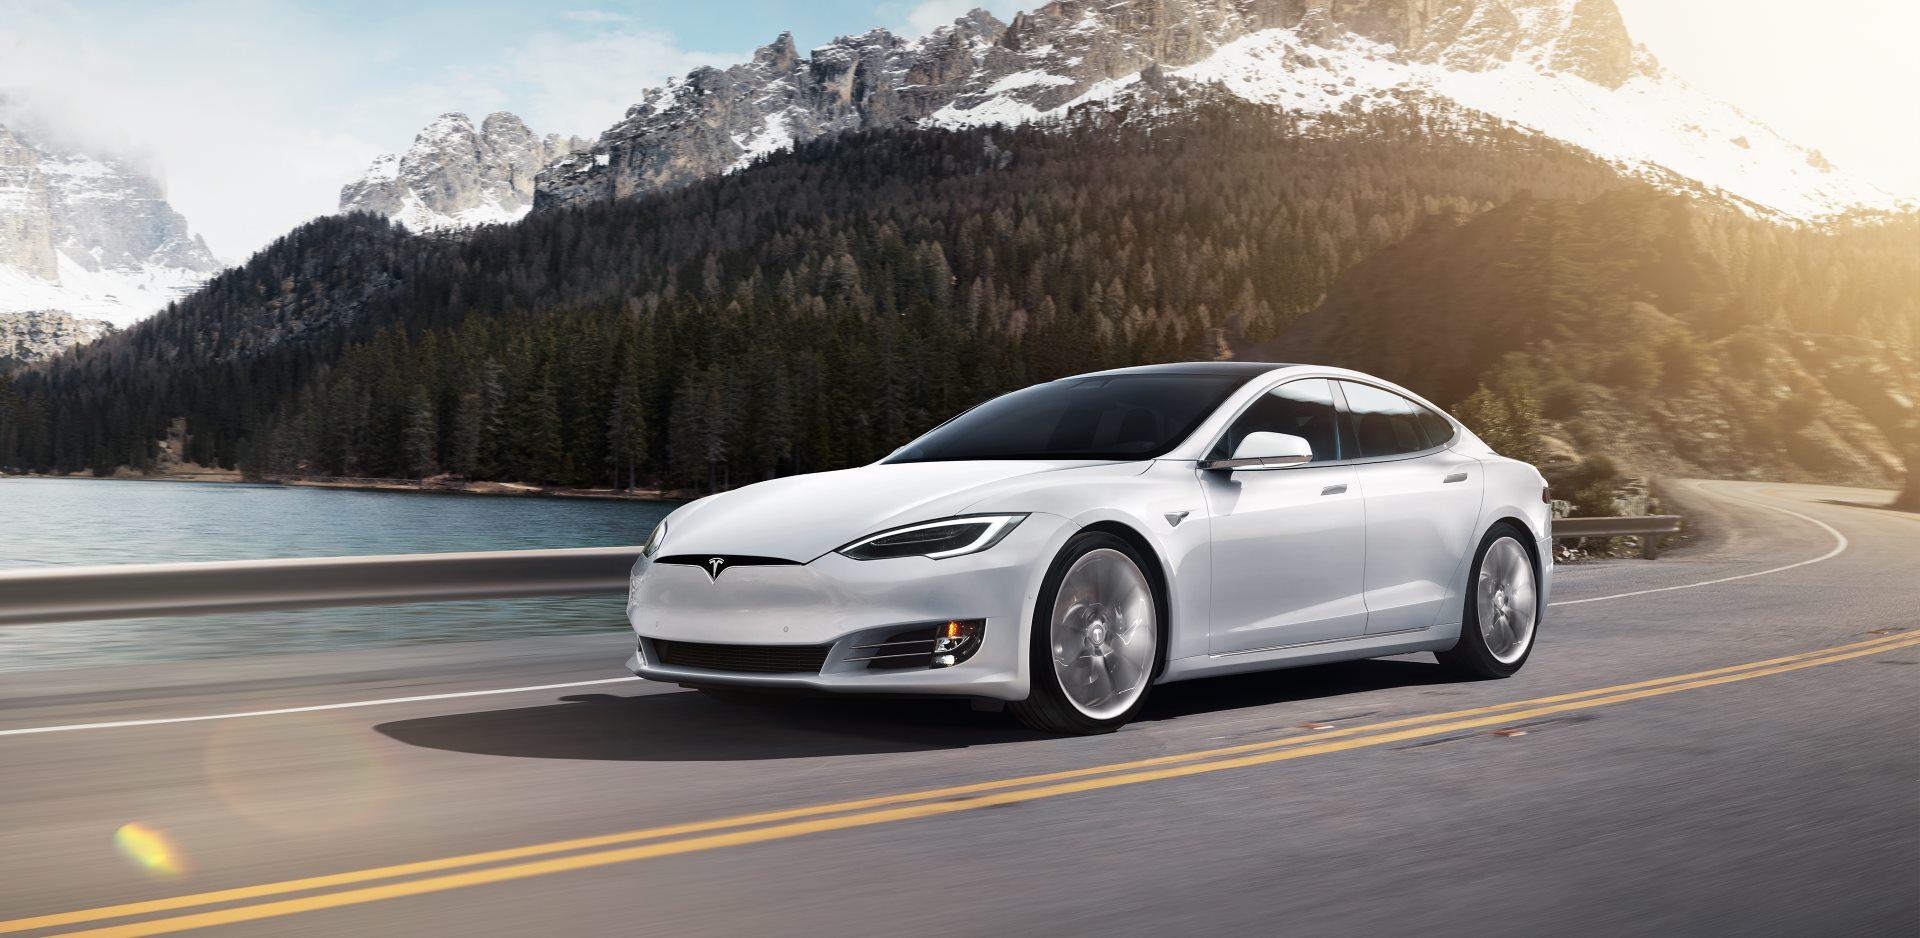 Tesla Model S At The Nürburgring Elon Musk Says Lap Time